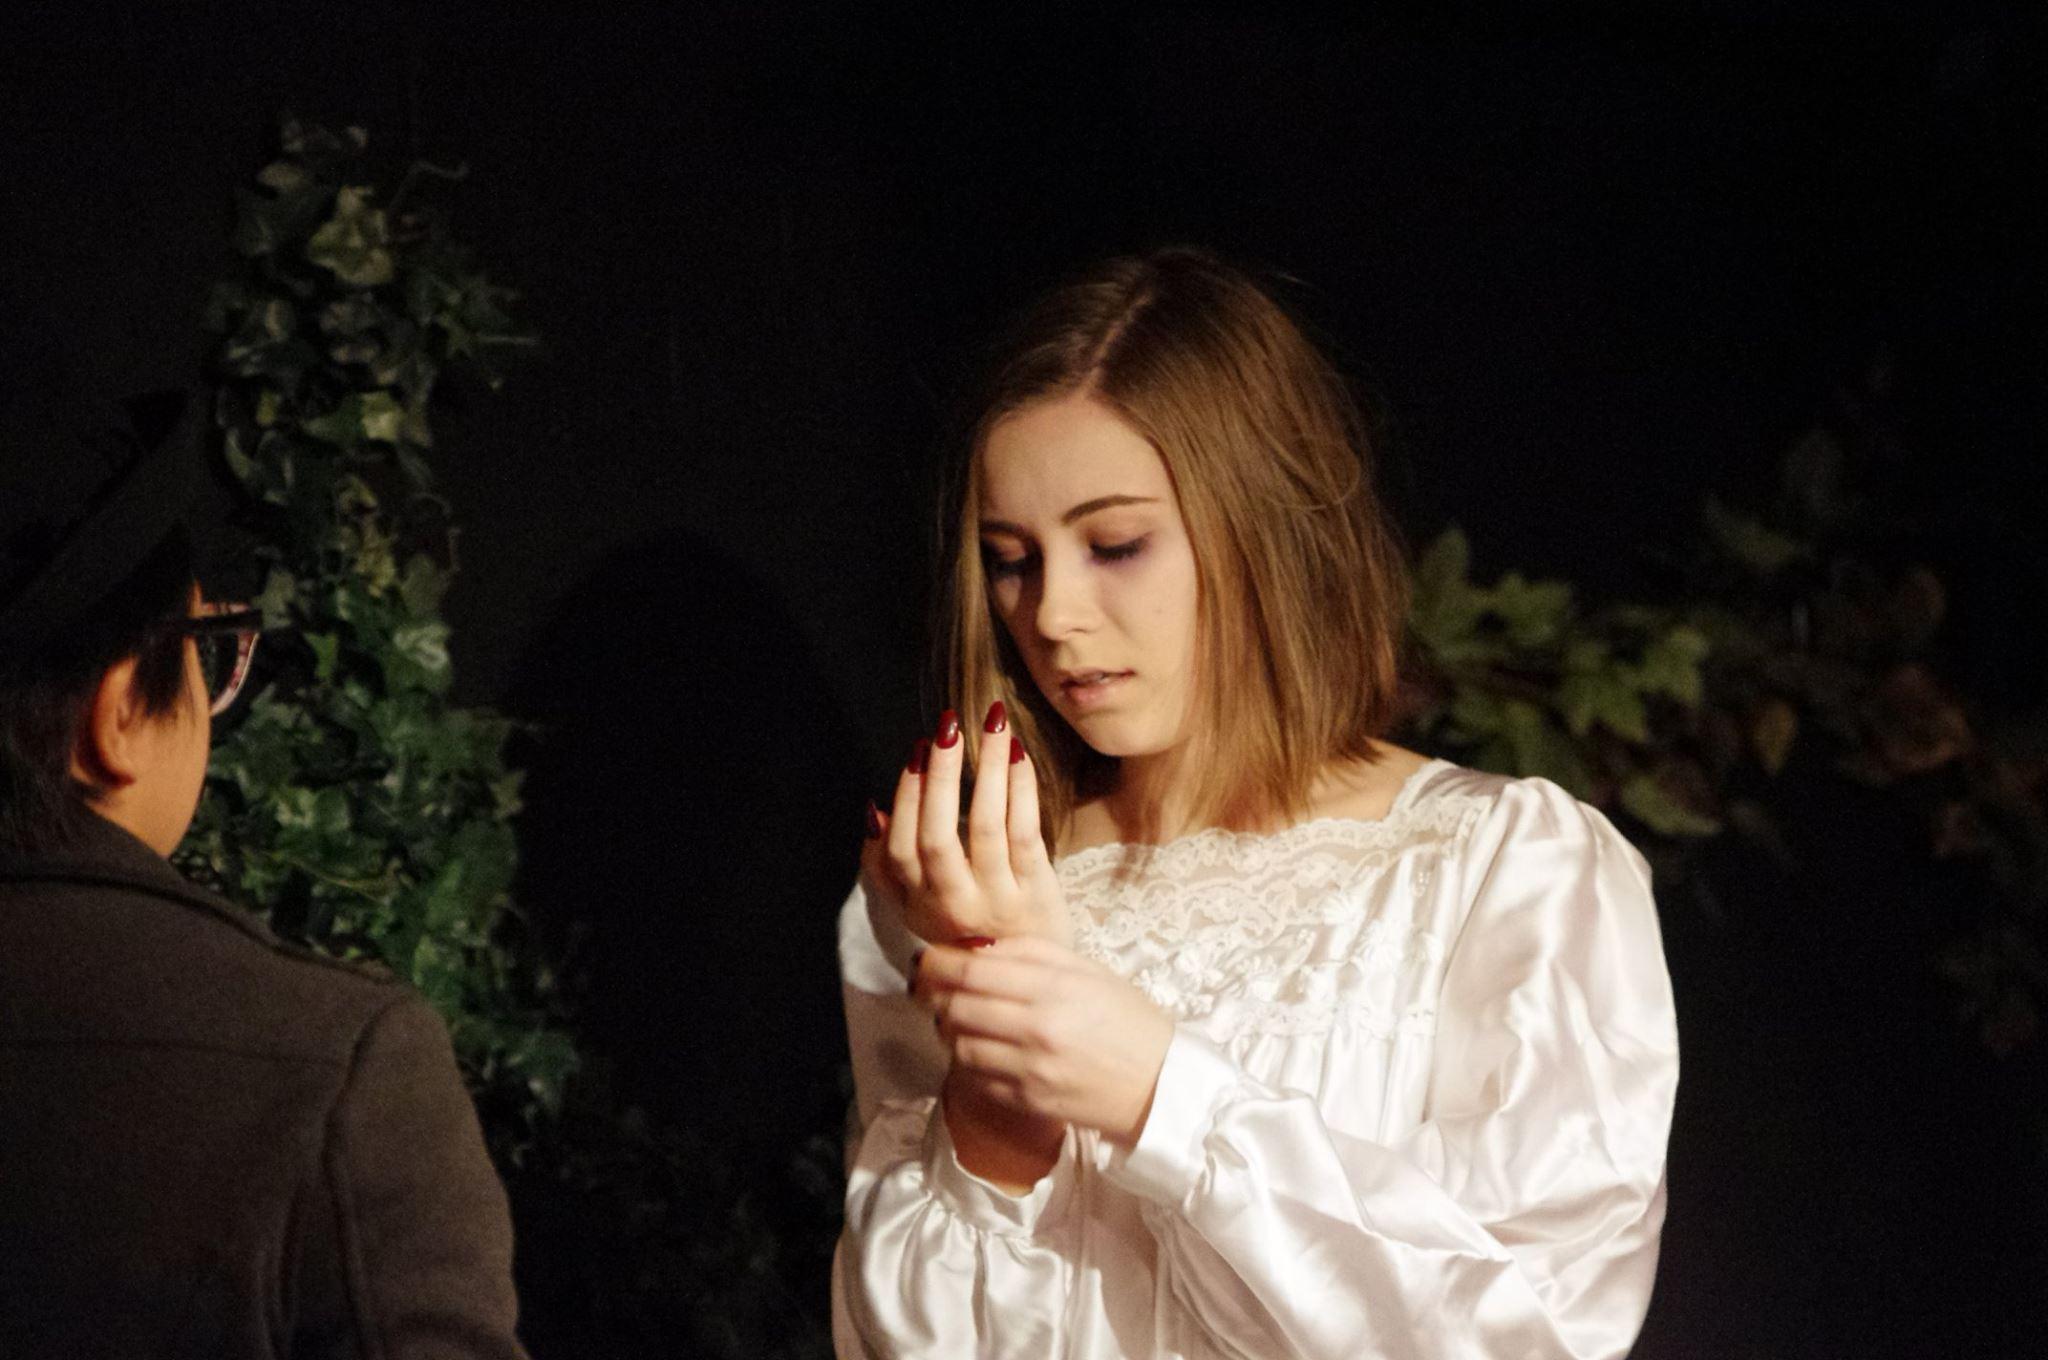 Lady Macbeth sleepwalks, Macbeth